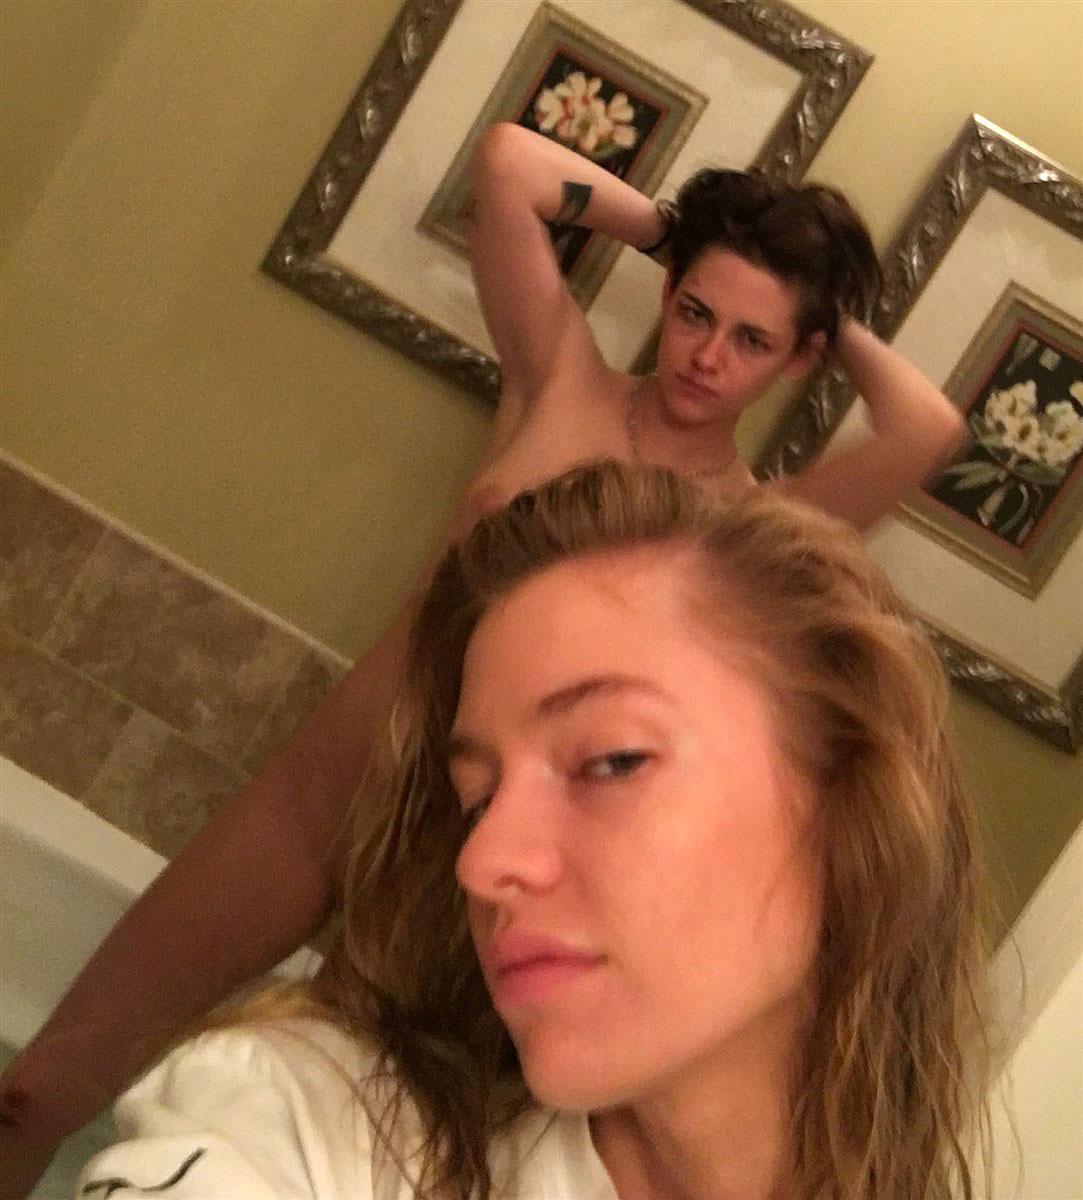 Hottest amature nude shots